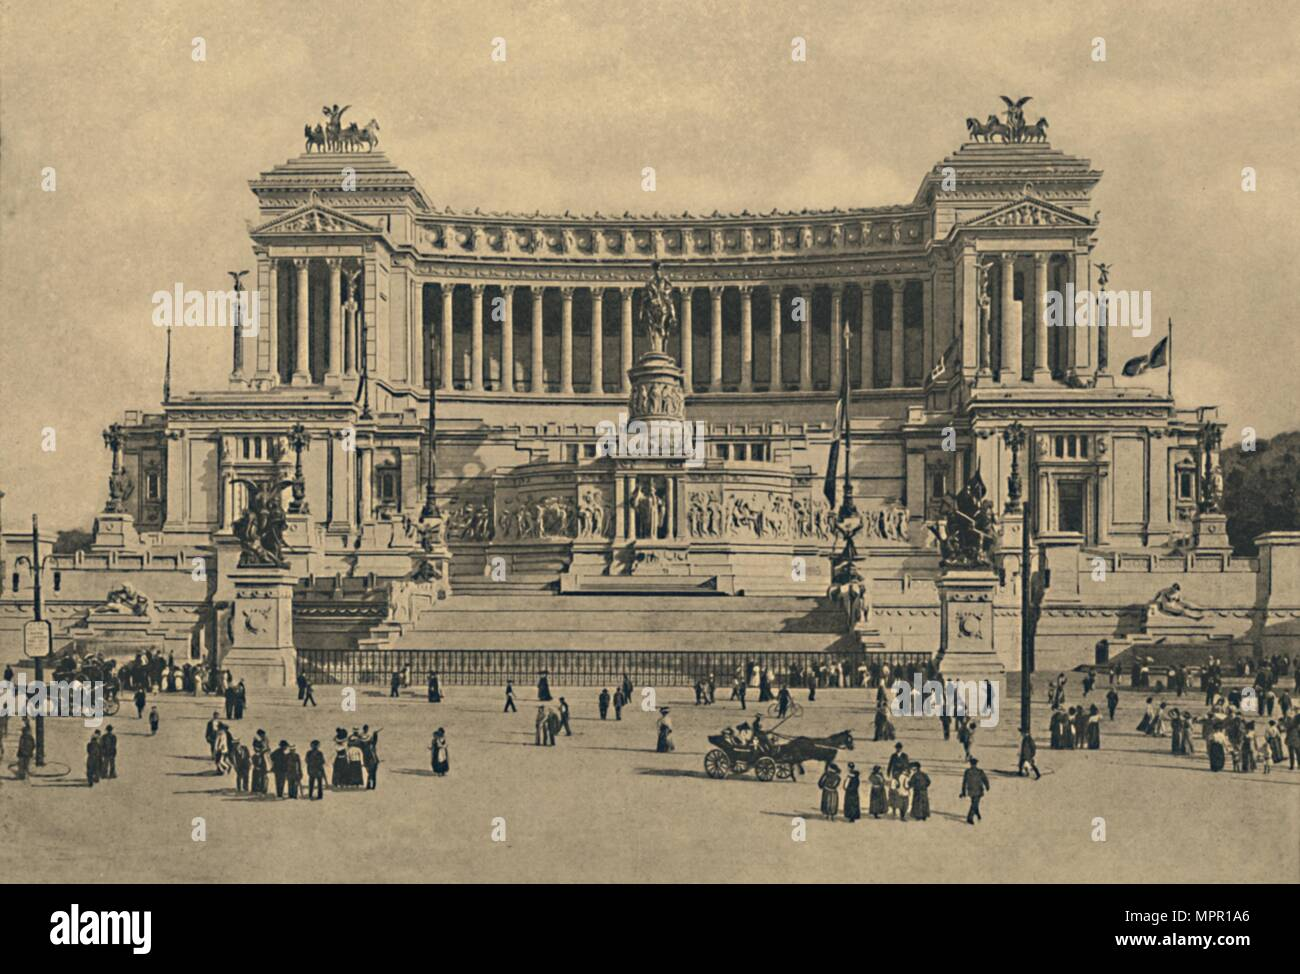 """Roma - Piazza di Venezia. Victor Emmanuel Denkmal II"", 1910. Artist: Unbekannt. Stockbild"